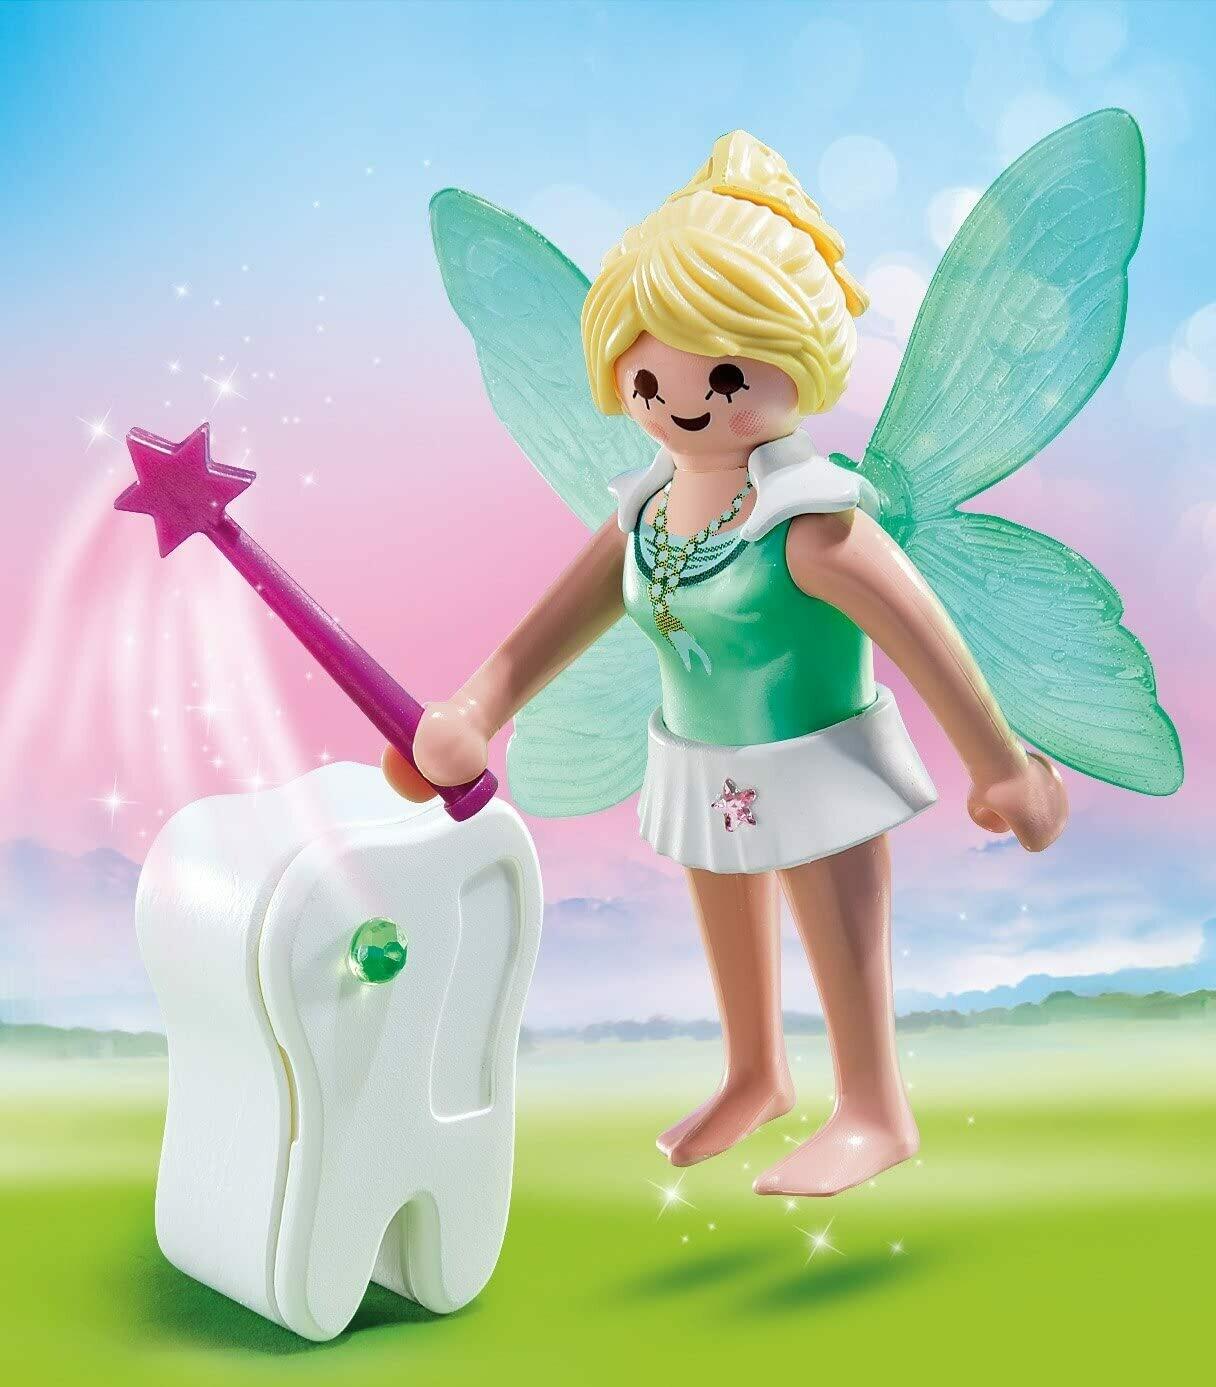 Playmobil: Tooth Fairy